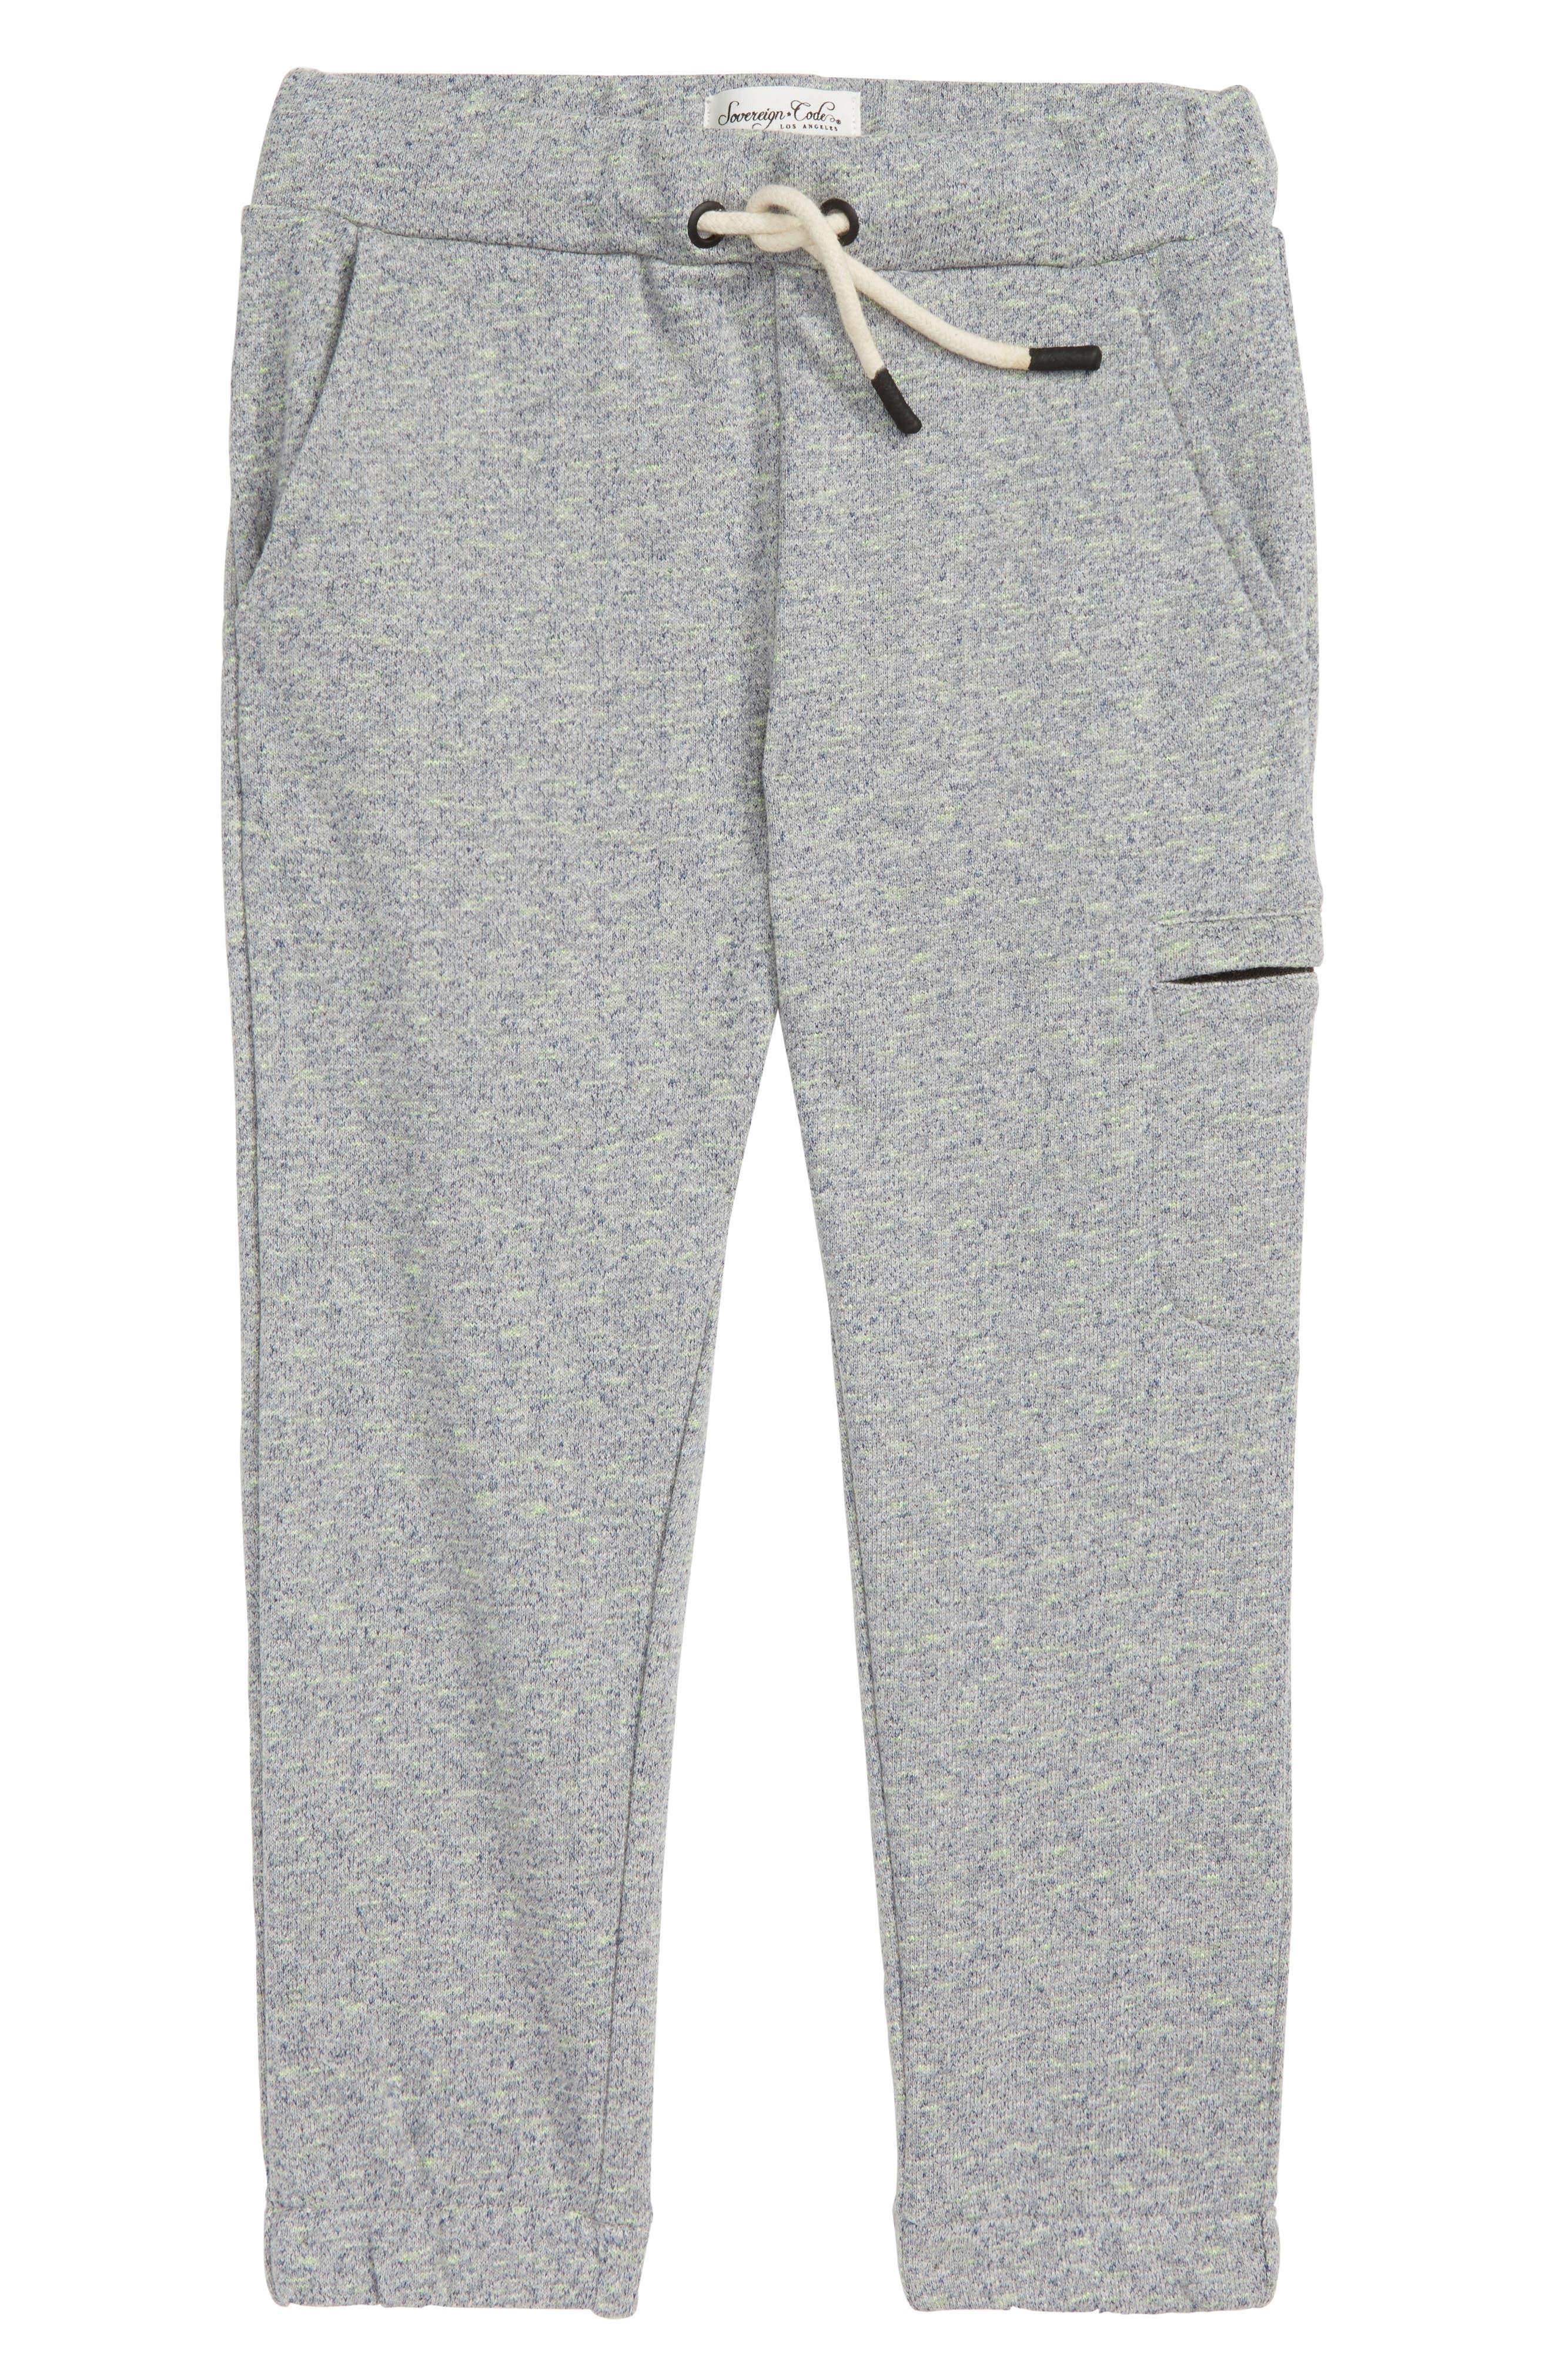 Chicago Pants,                         Main,                         color, 400